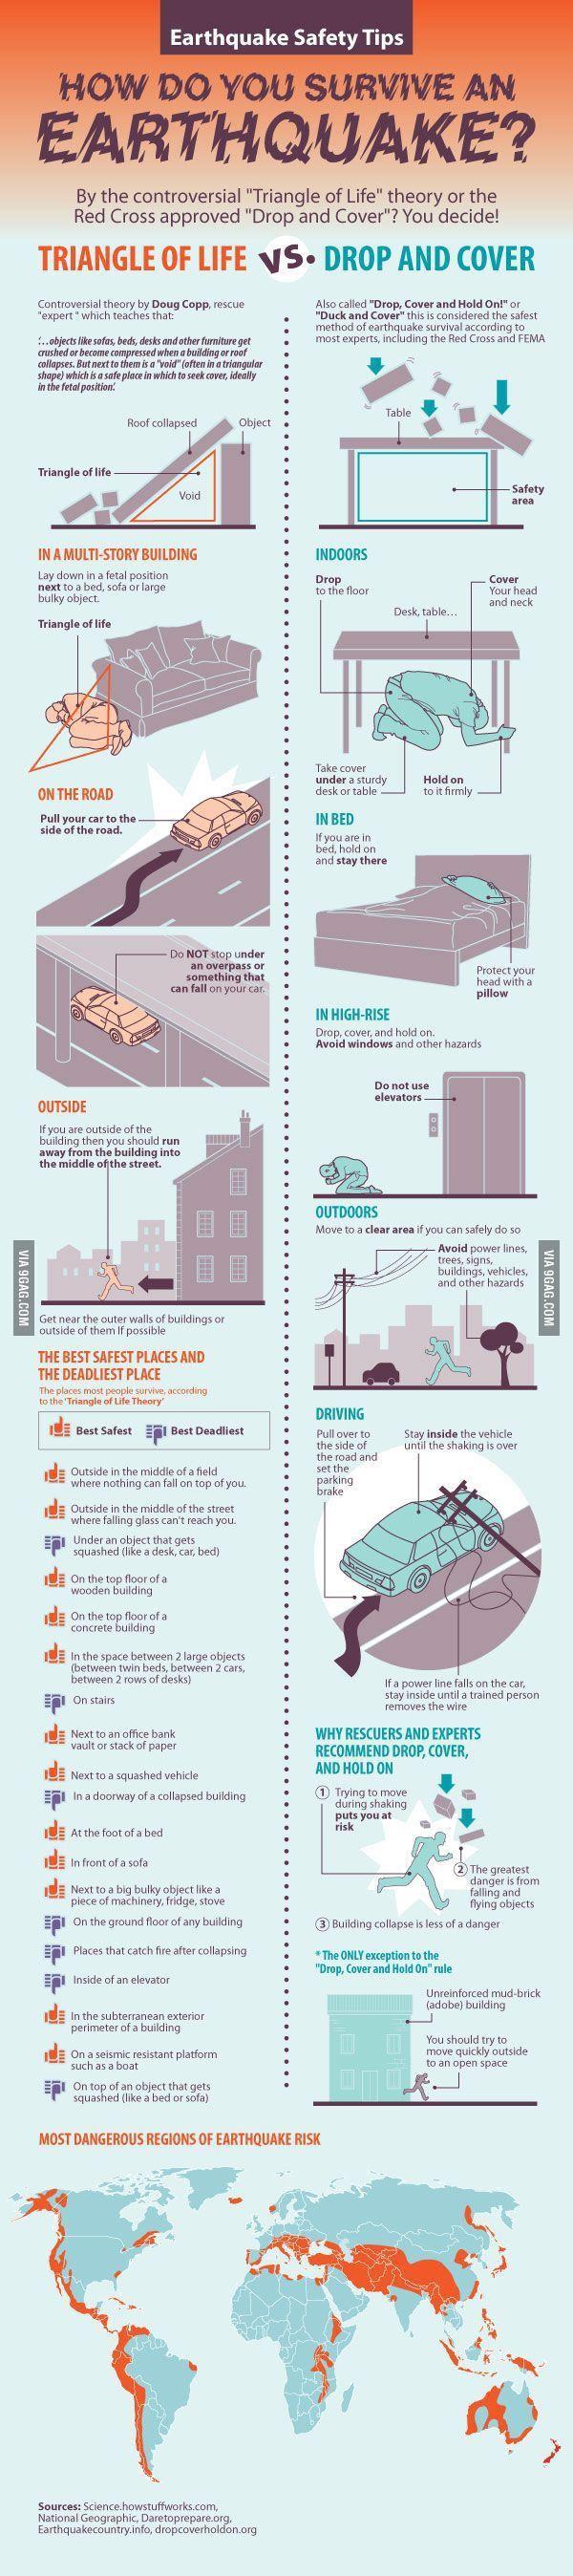 Earthquake safety tips ERGONOMICS ,SAFETY AT WORK- ΕΡΓΟΝΟΜΙΑ, ΑΣΦΑΛΕΙΑ ΣΤΗΝ ΕΡΓΑΣΙΑ